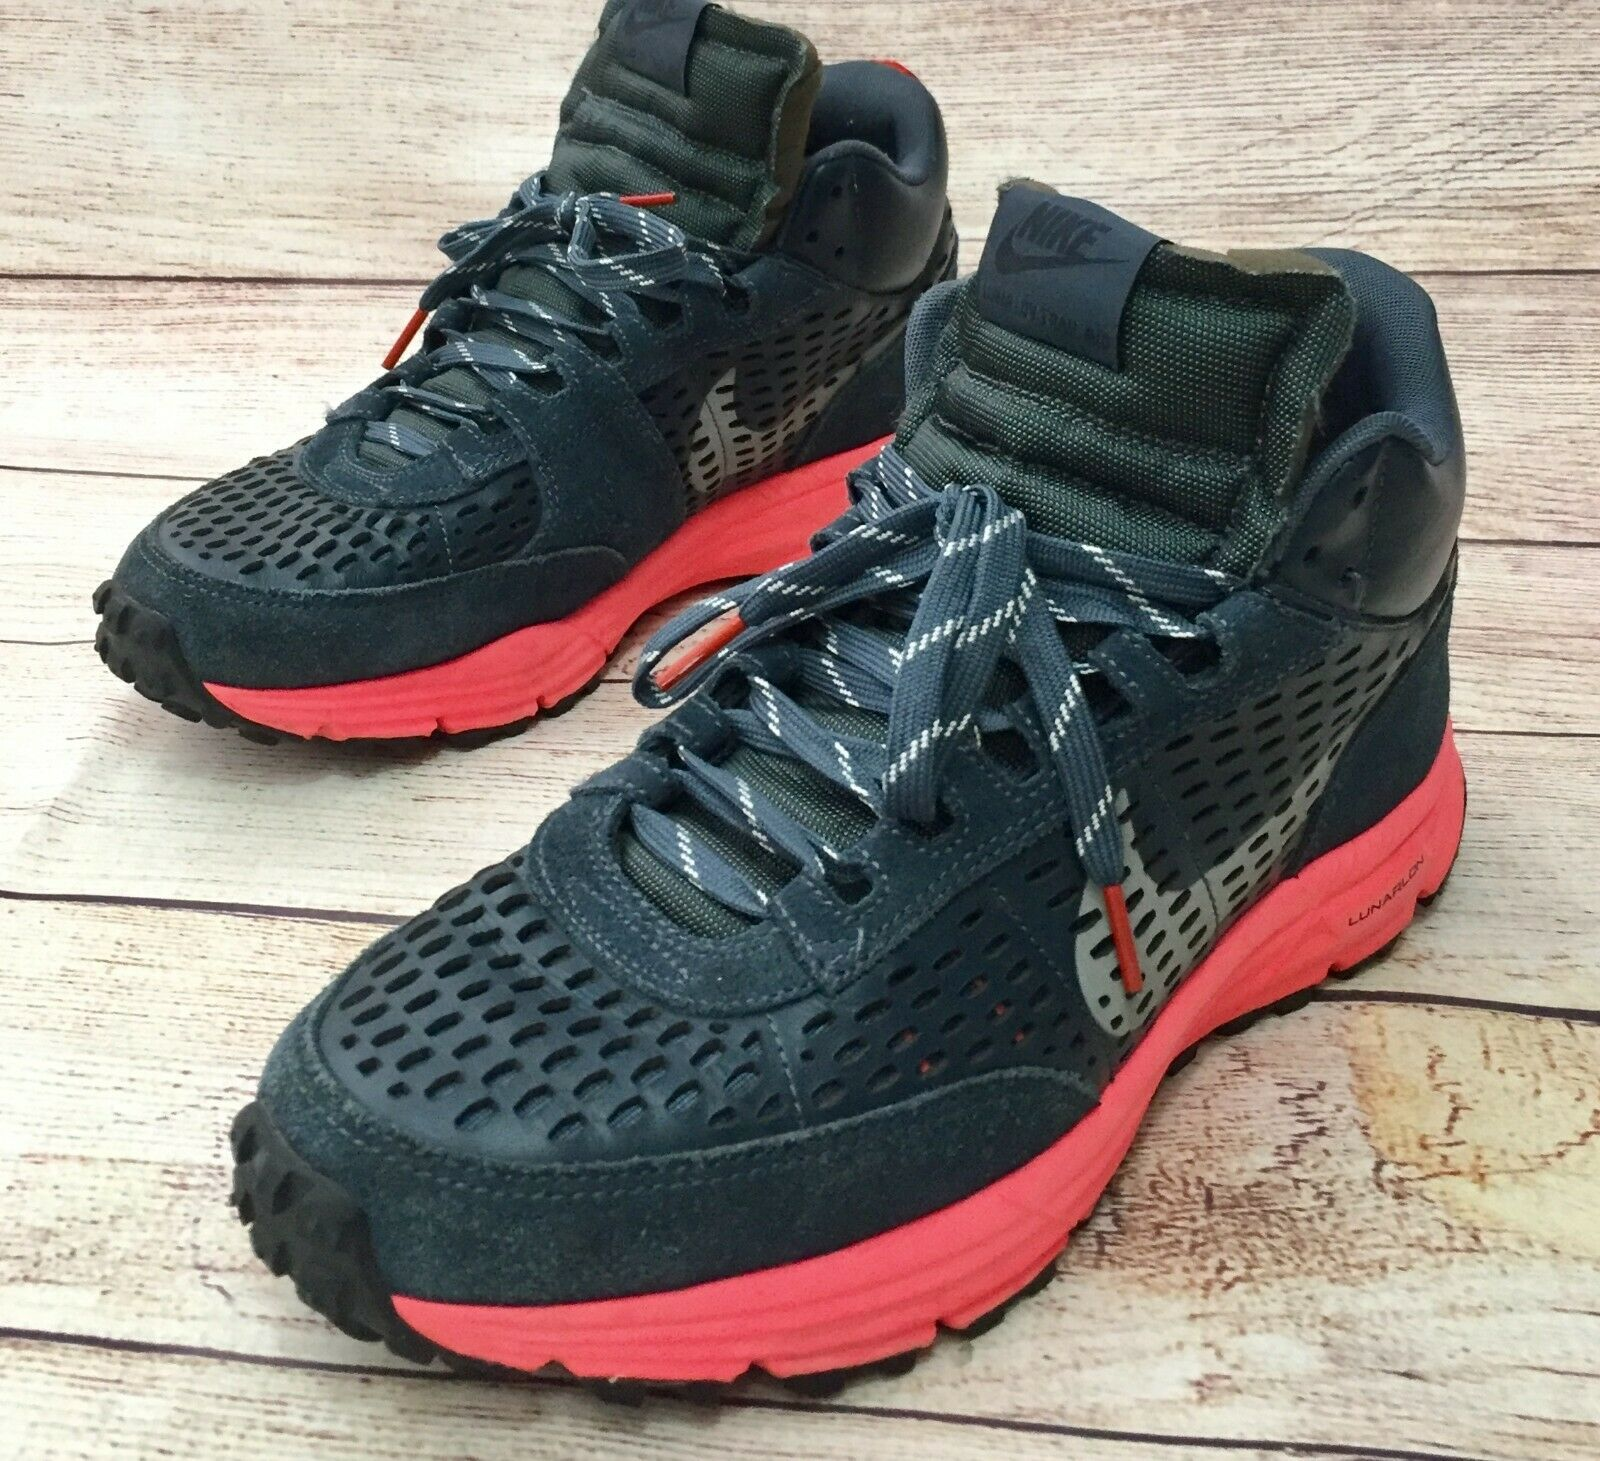 Nike Lunar LDV Trail Mid Mens Sz 10 Hiking shoes Sneaker Boot bluee 599471-404